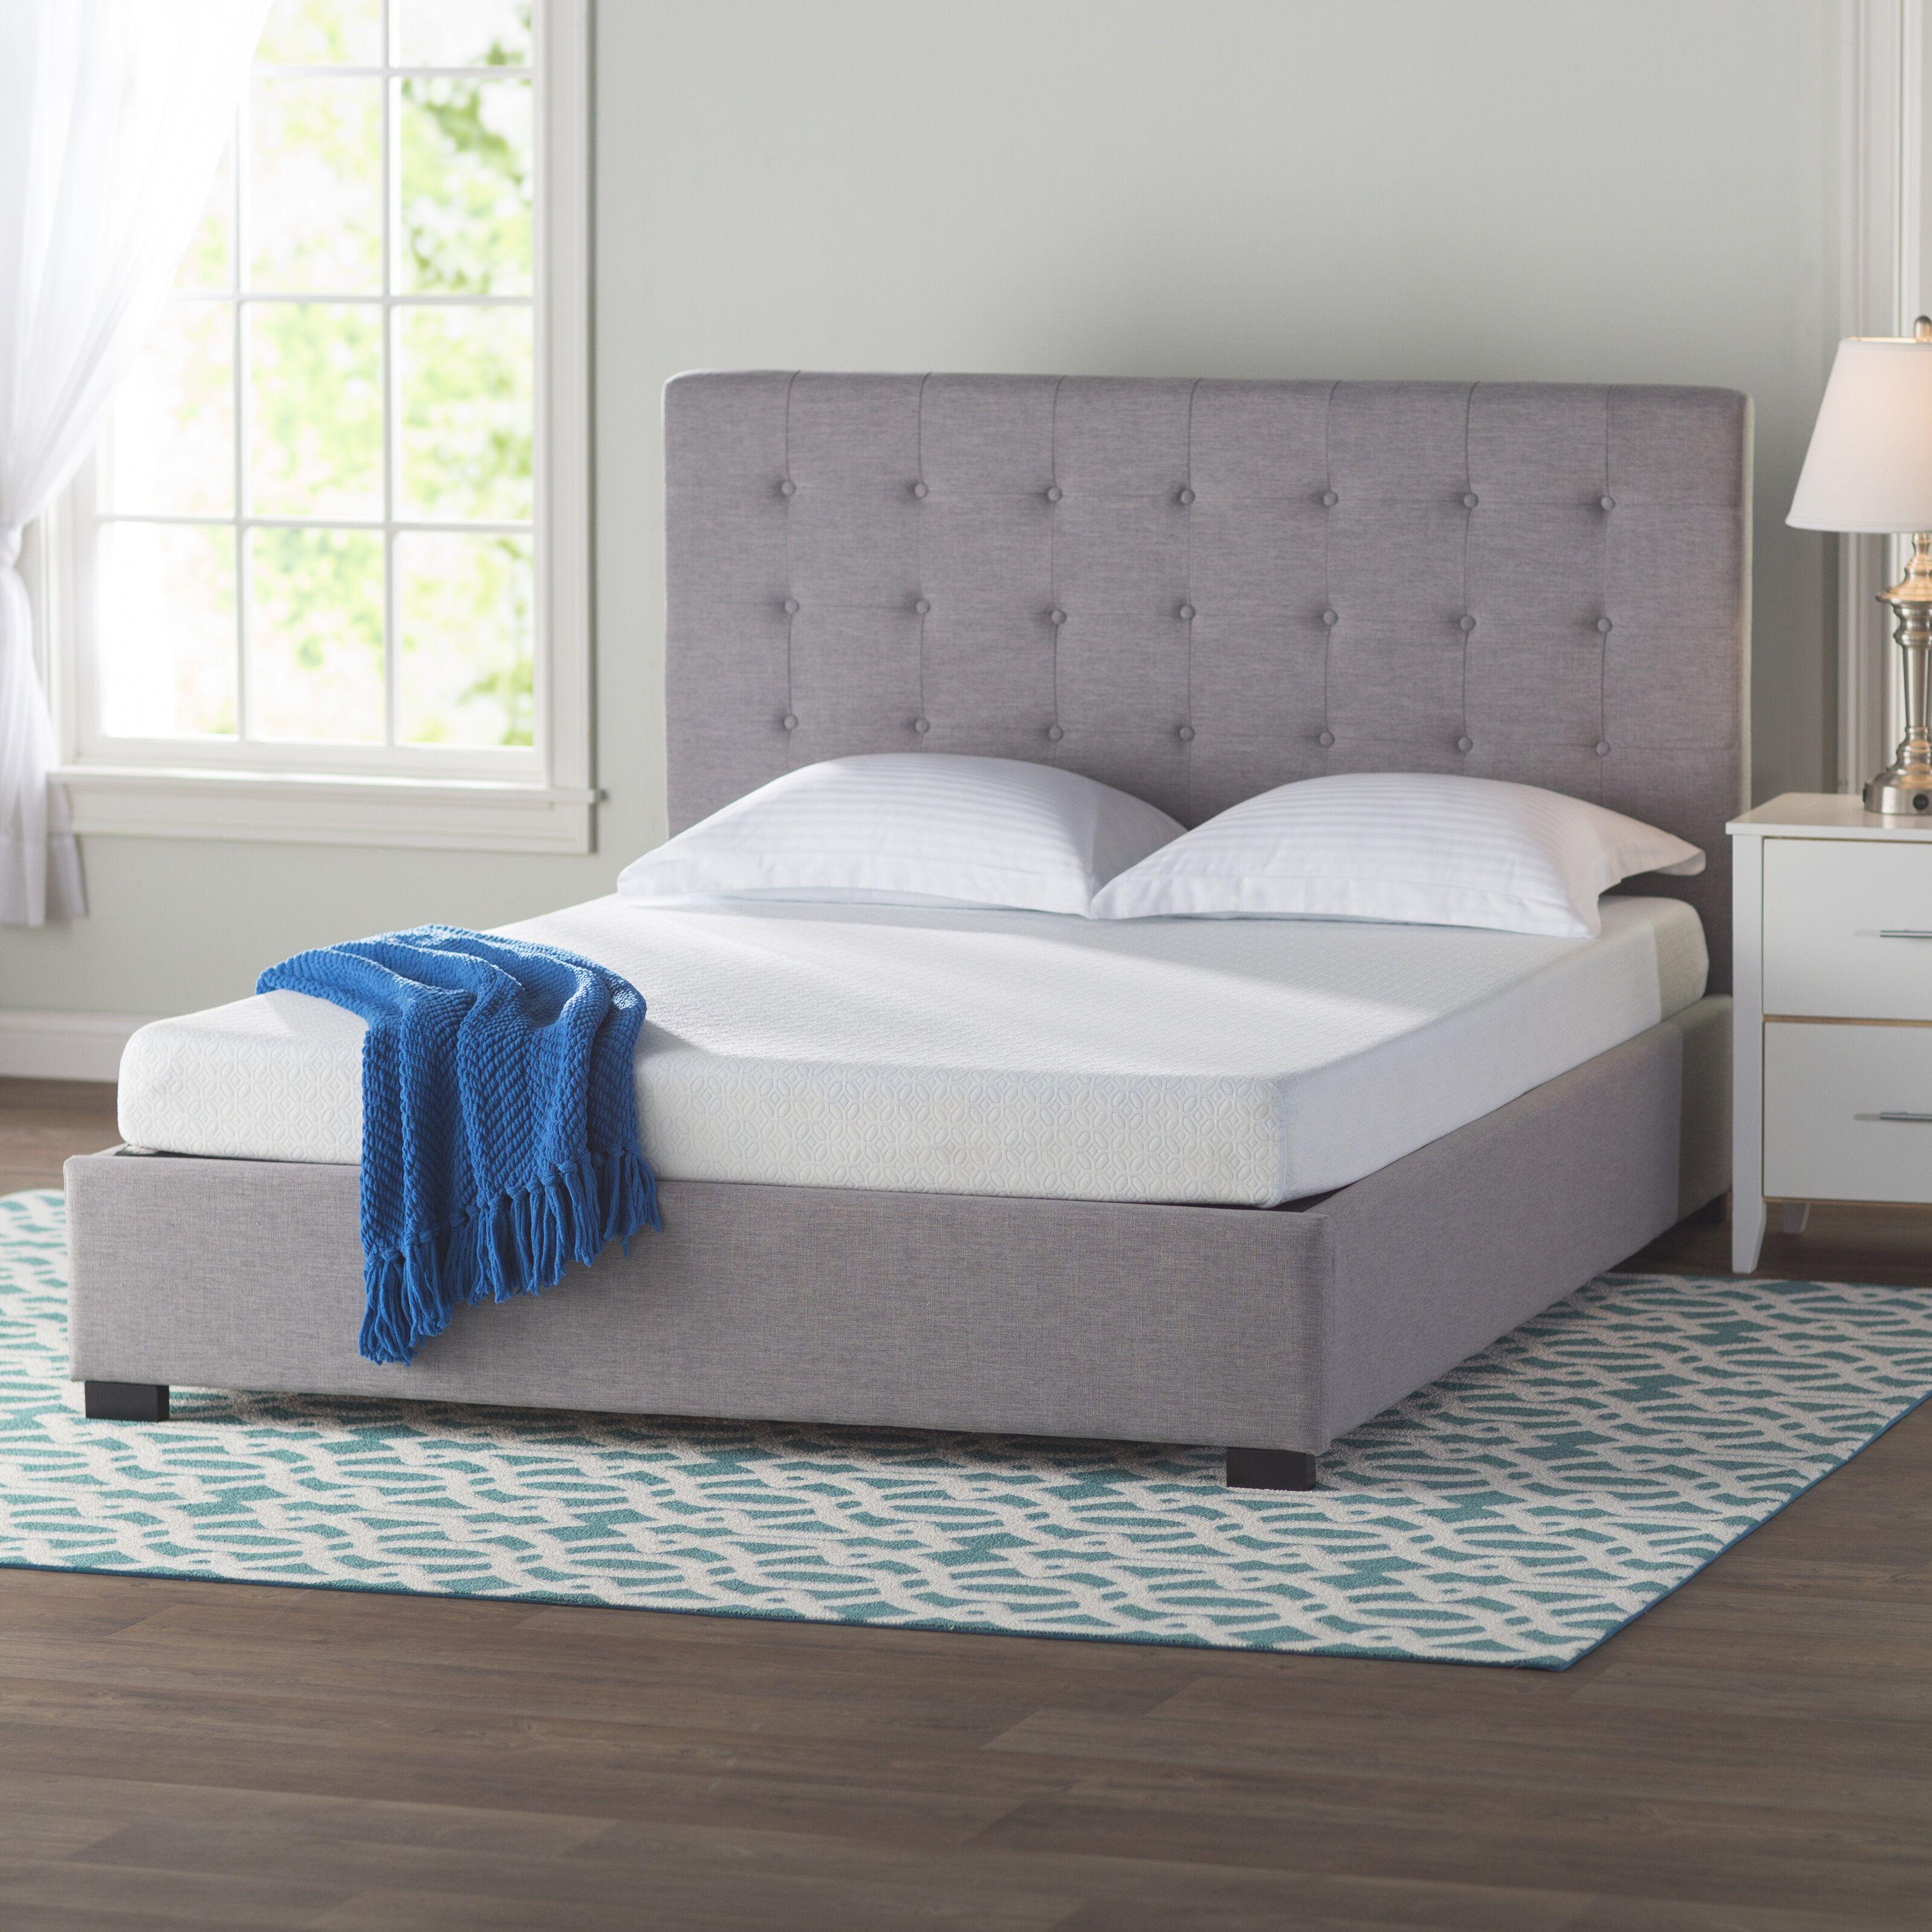 Hughes Queen Upholstered Platform Bed Firm memory foam